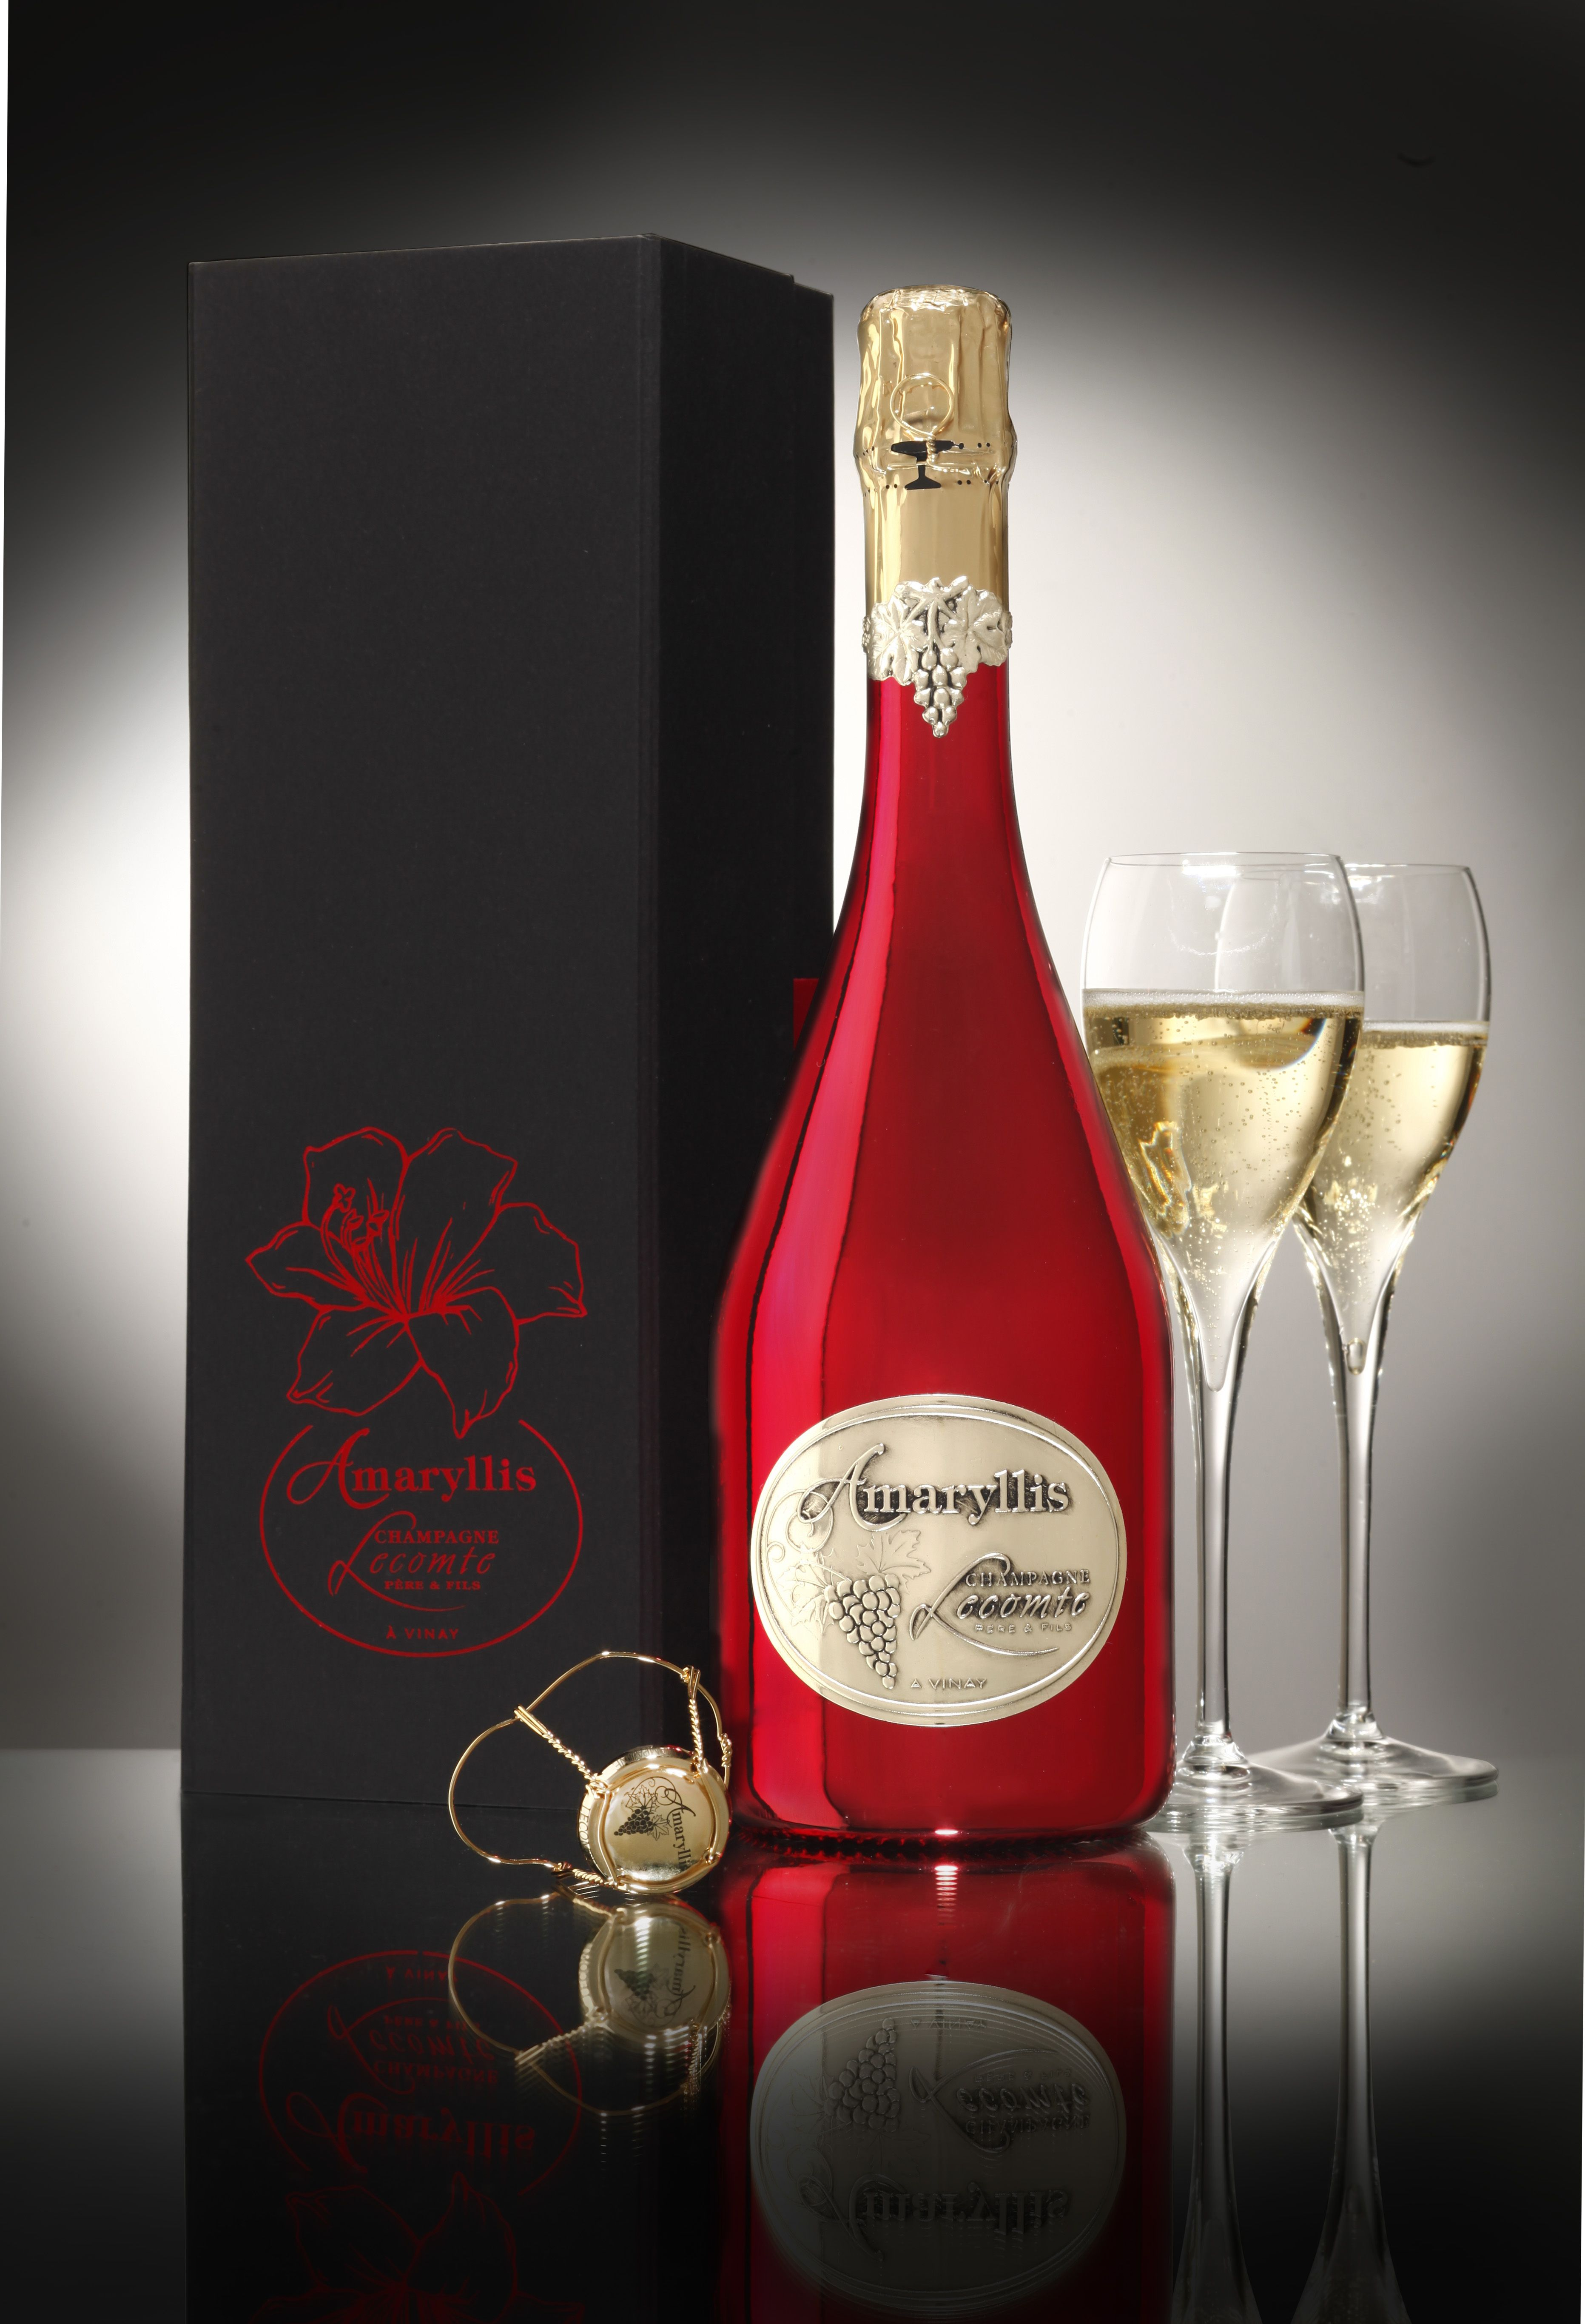 Amaryllis Champagne Birthday Drinks Champagne Bottles Sparkling Wine